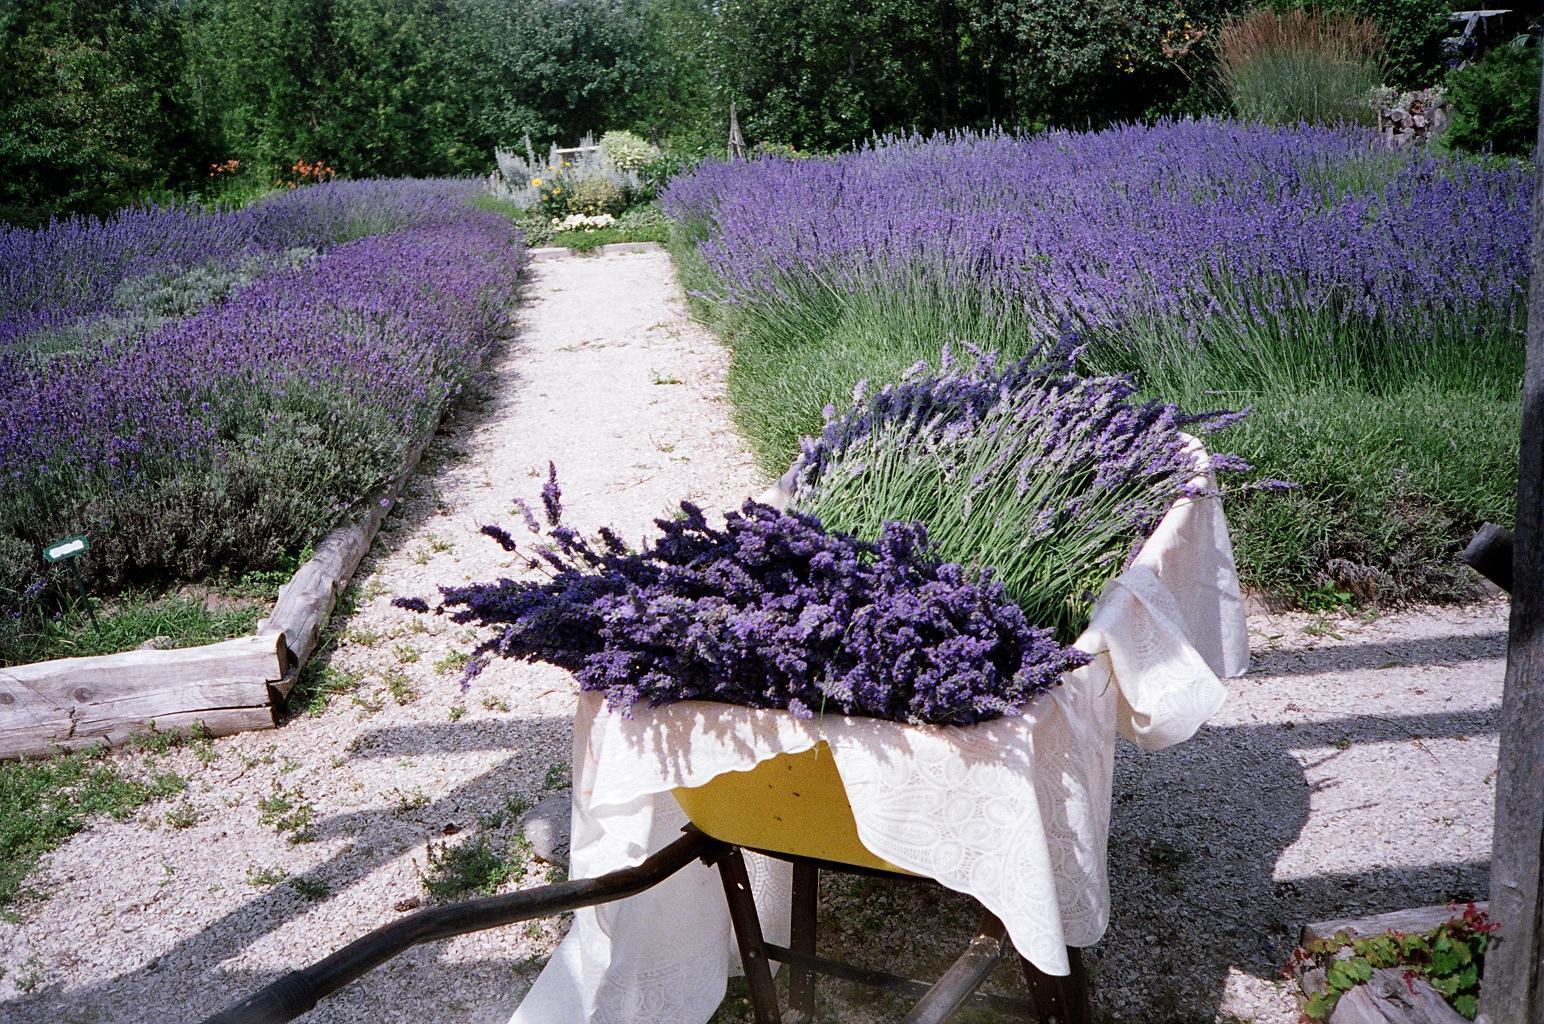 Lavender Garden - Obrázek č. 1